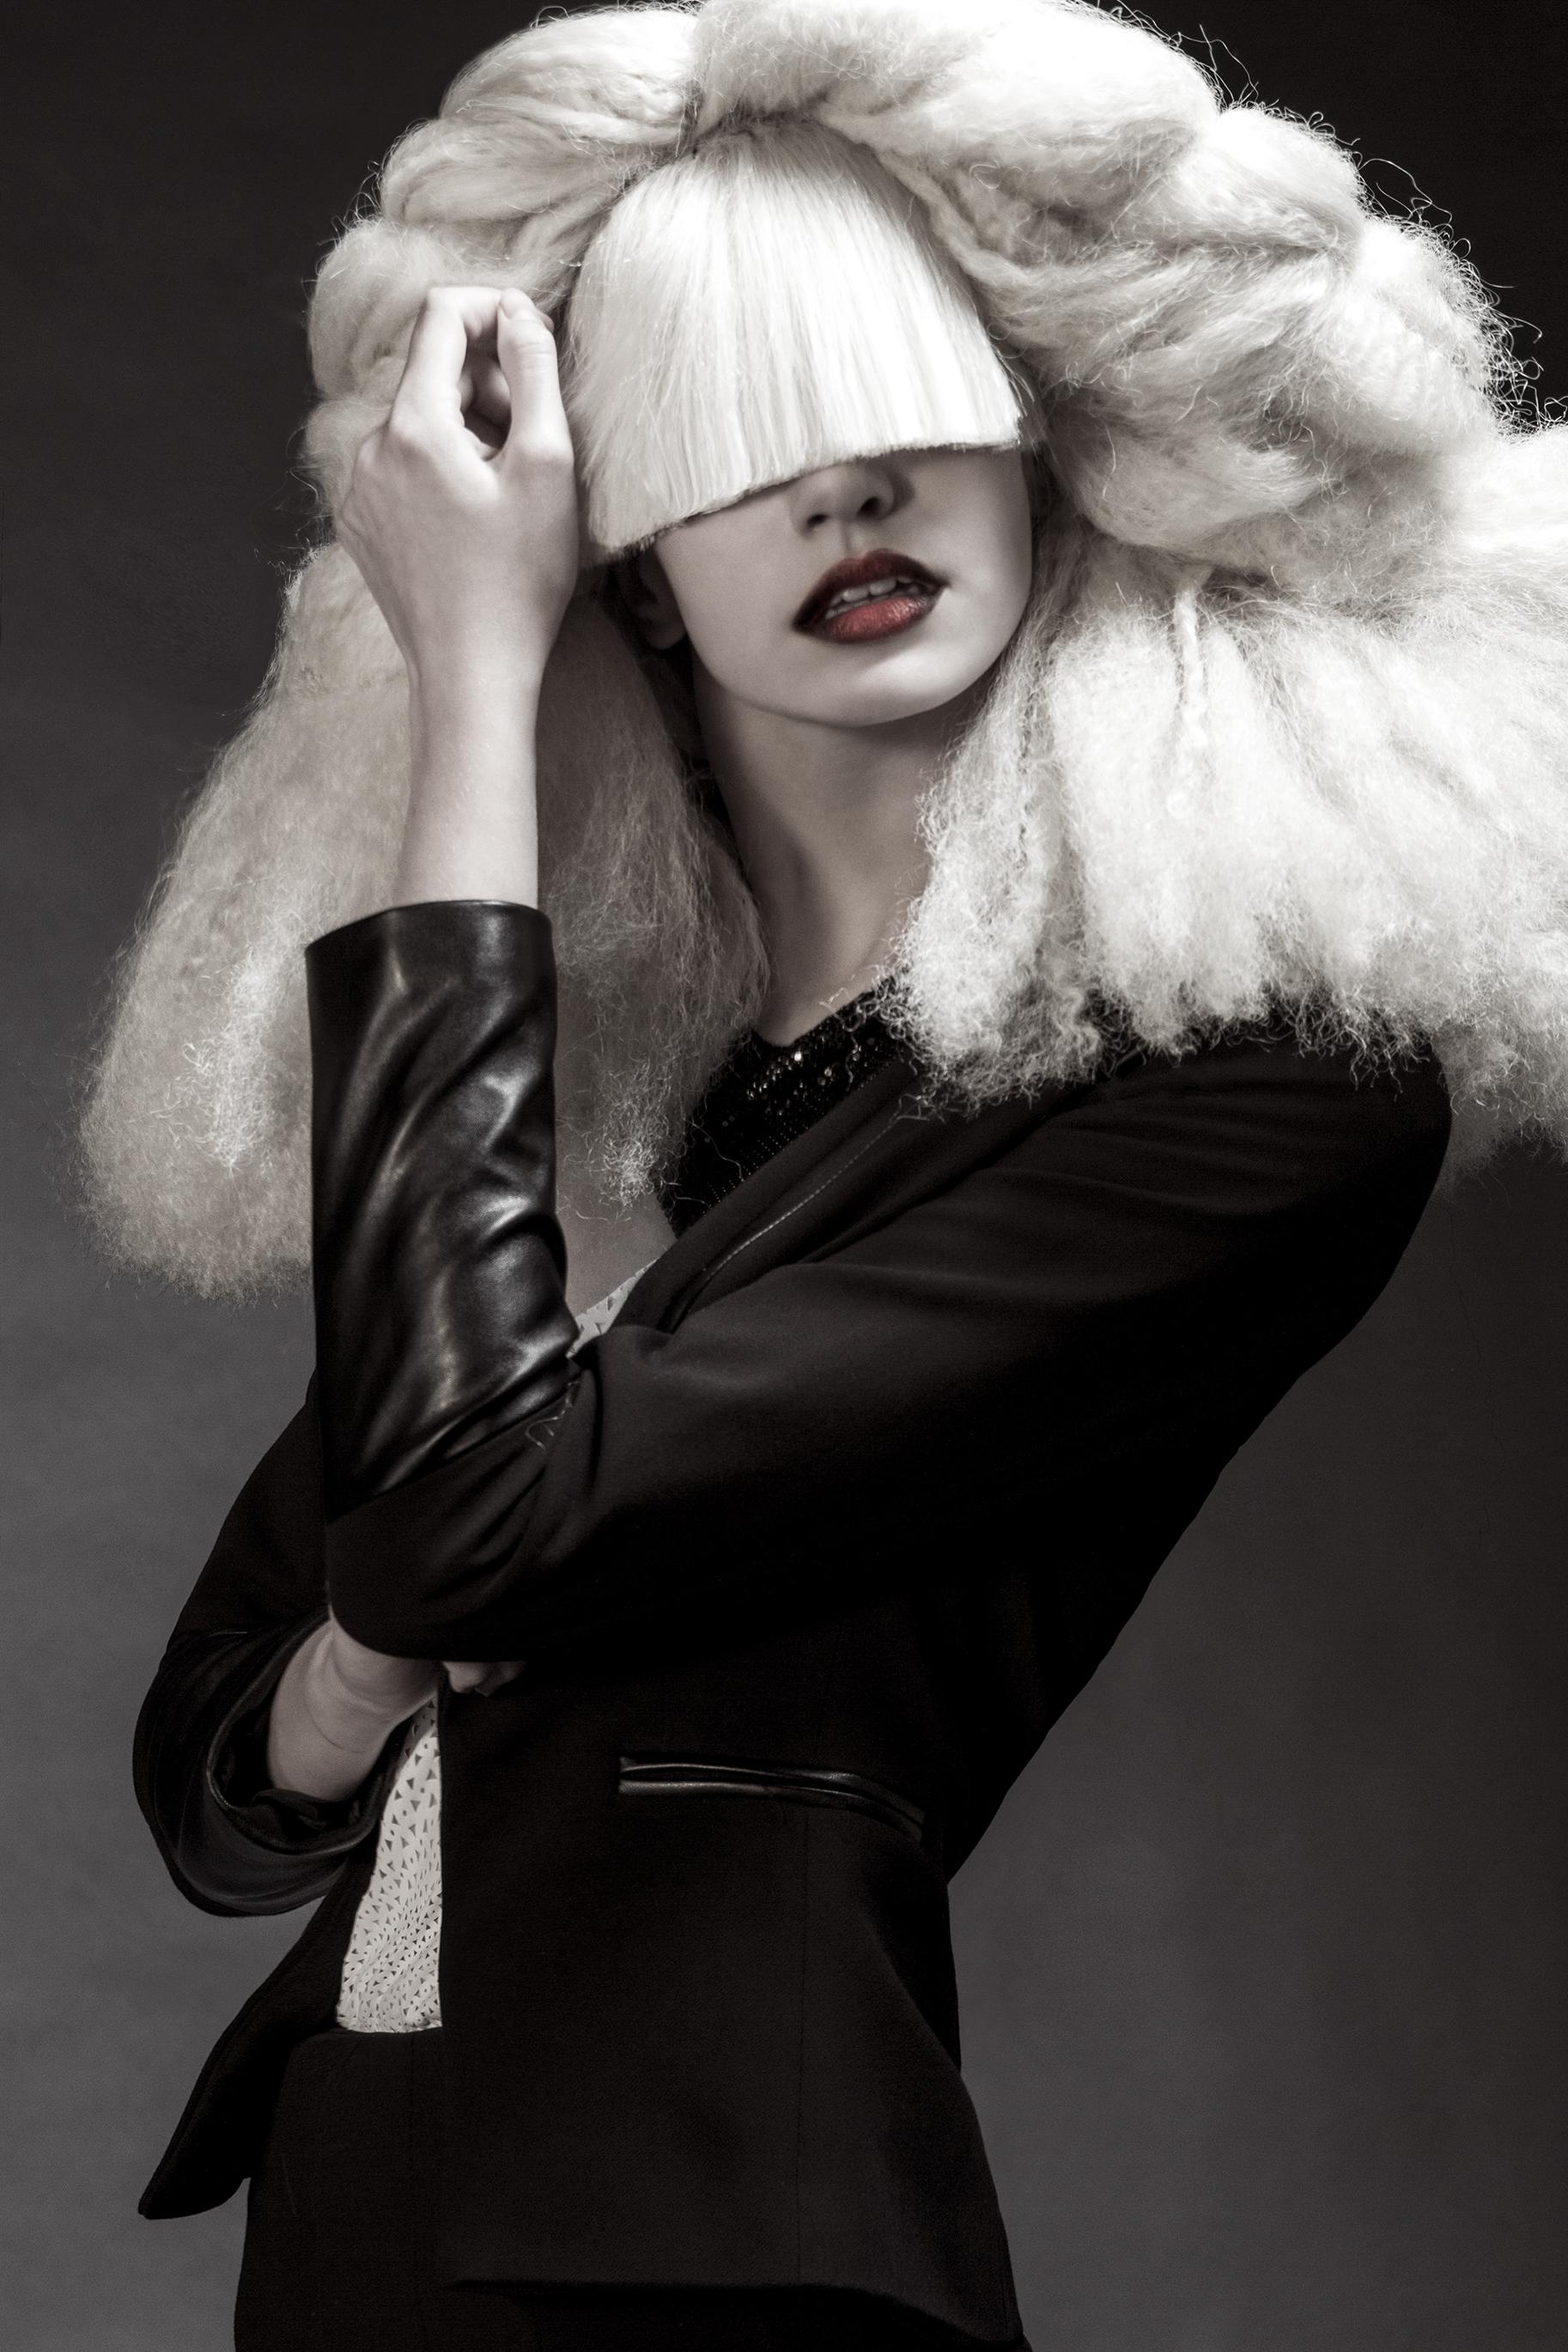 fashion-edgy-editorial-dark-gothic-bighair-platinum-blonde-moody-leather-sleek-black-beuty-hombre-makeup-redlip08.jpg